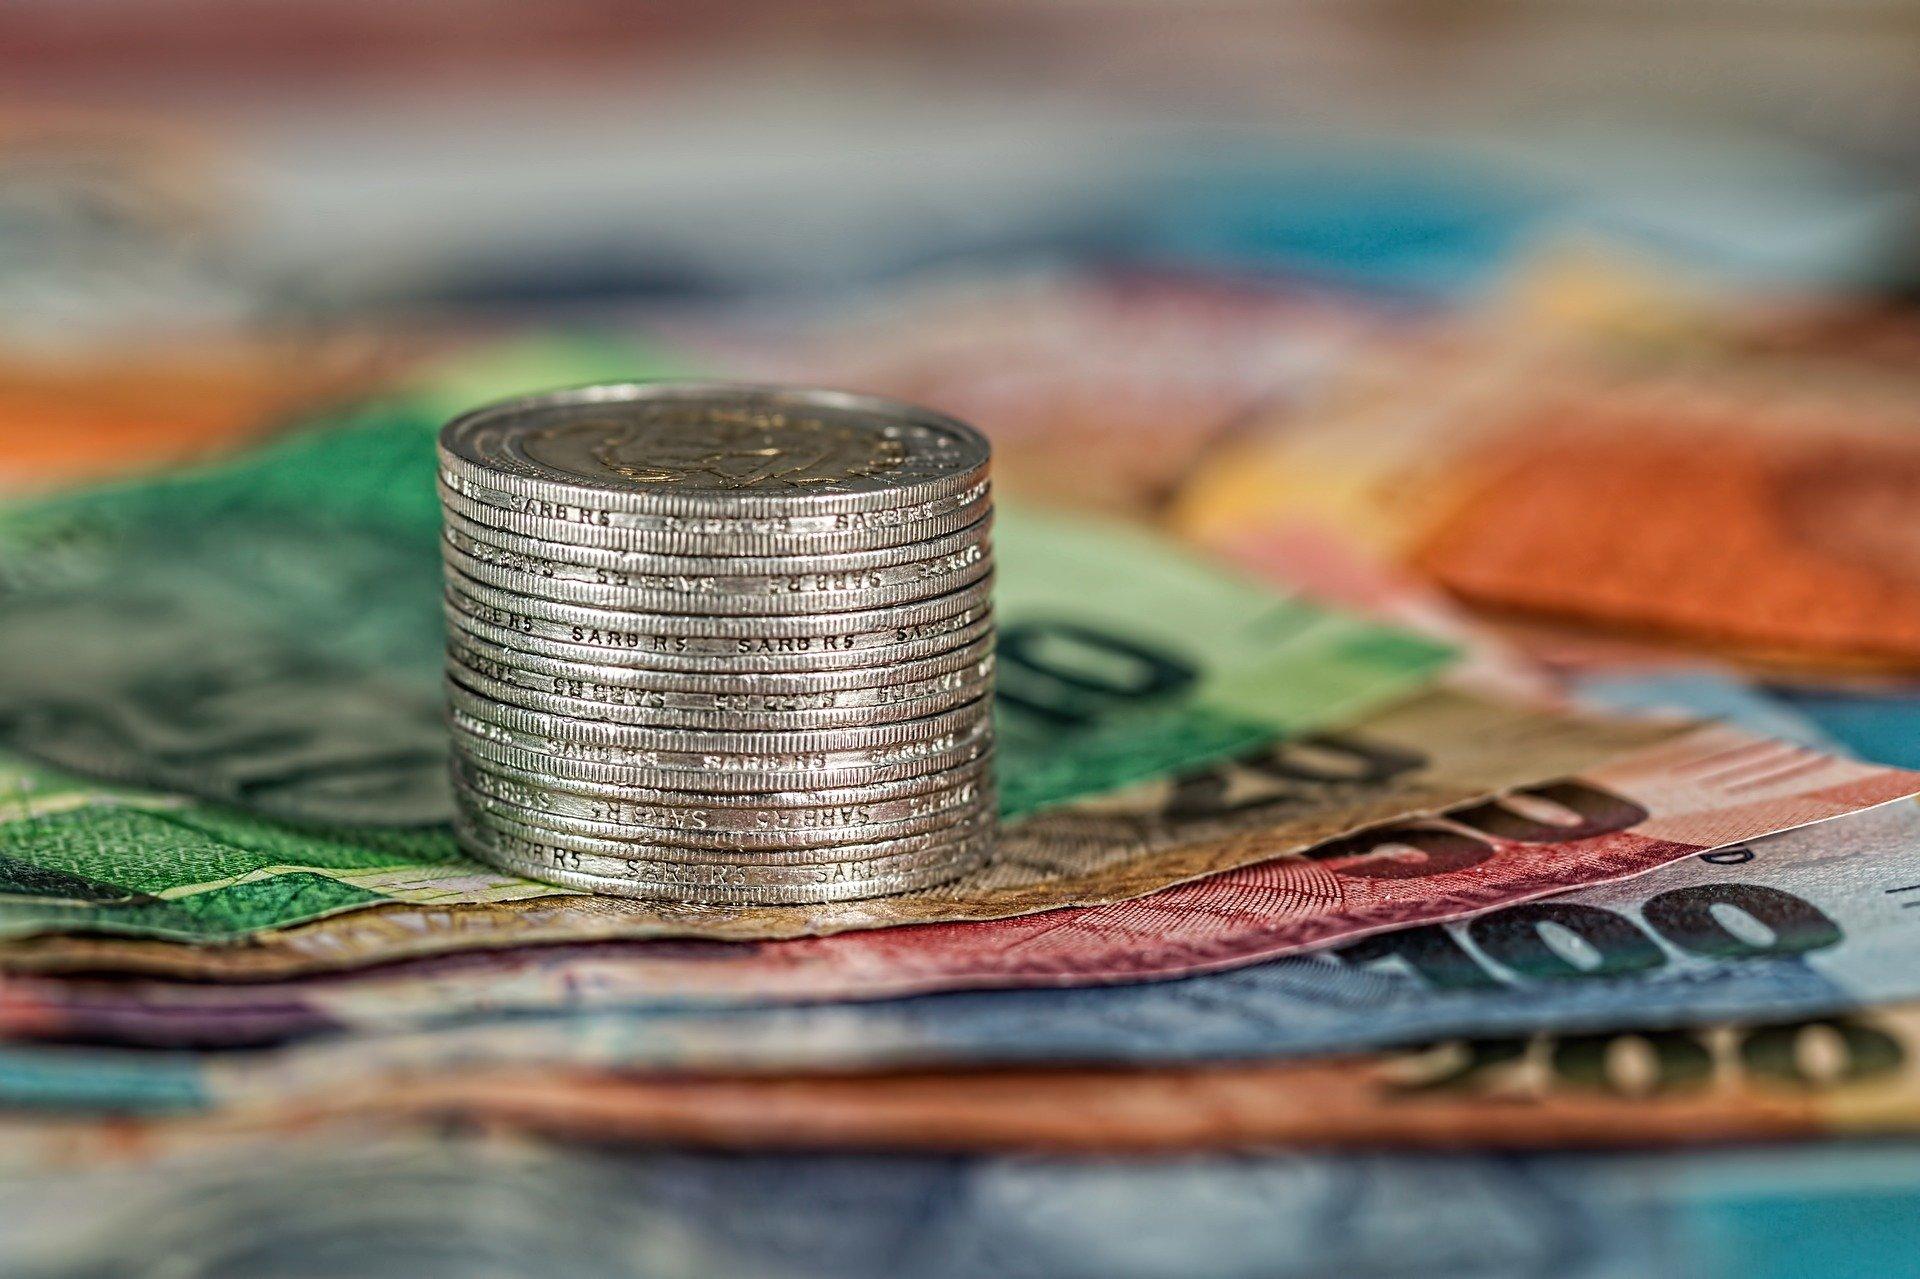 fondos de inversión, Inverco, crisis económica